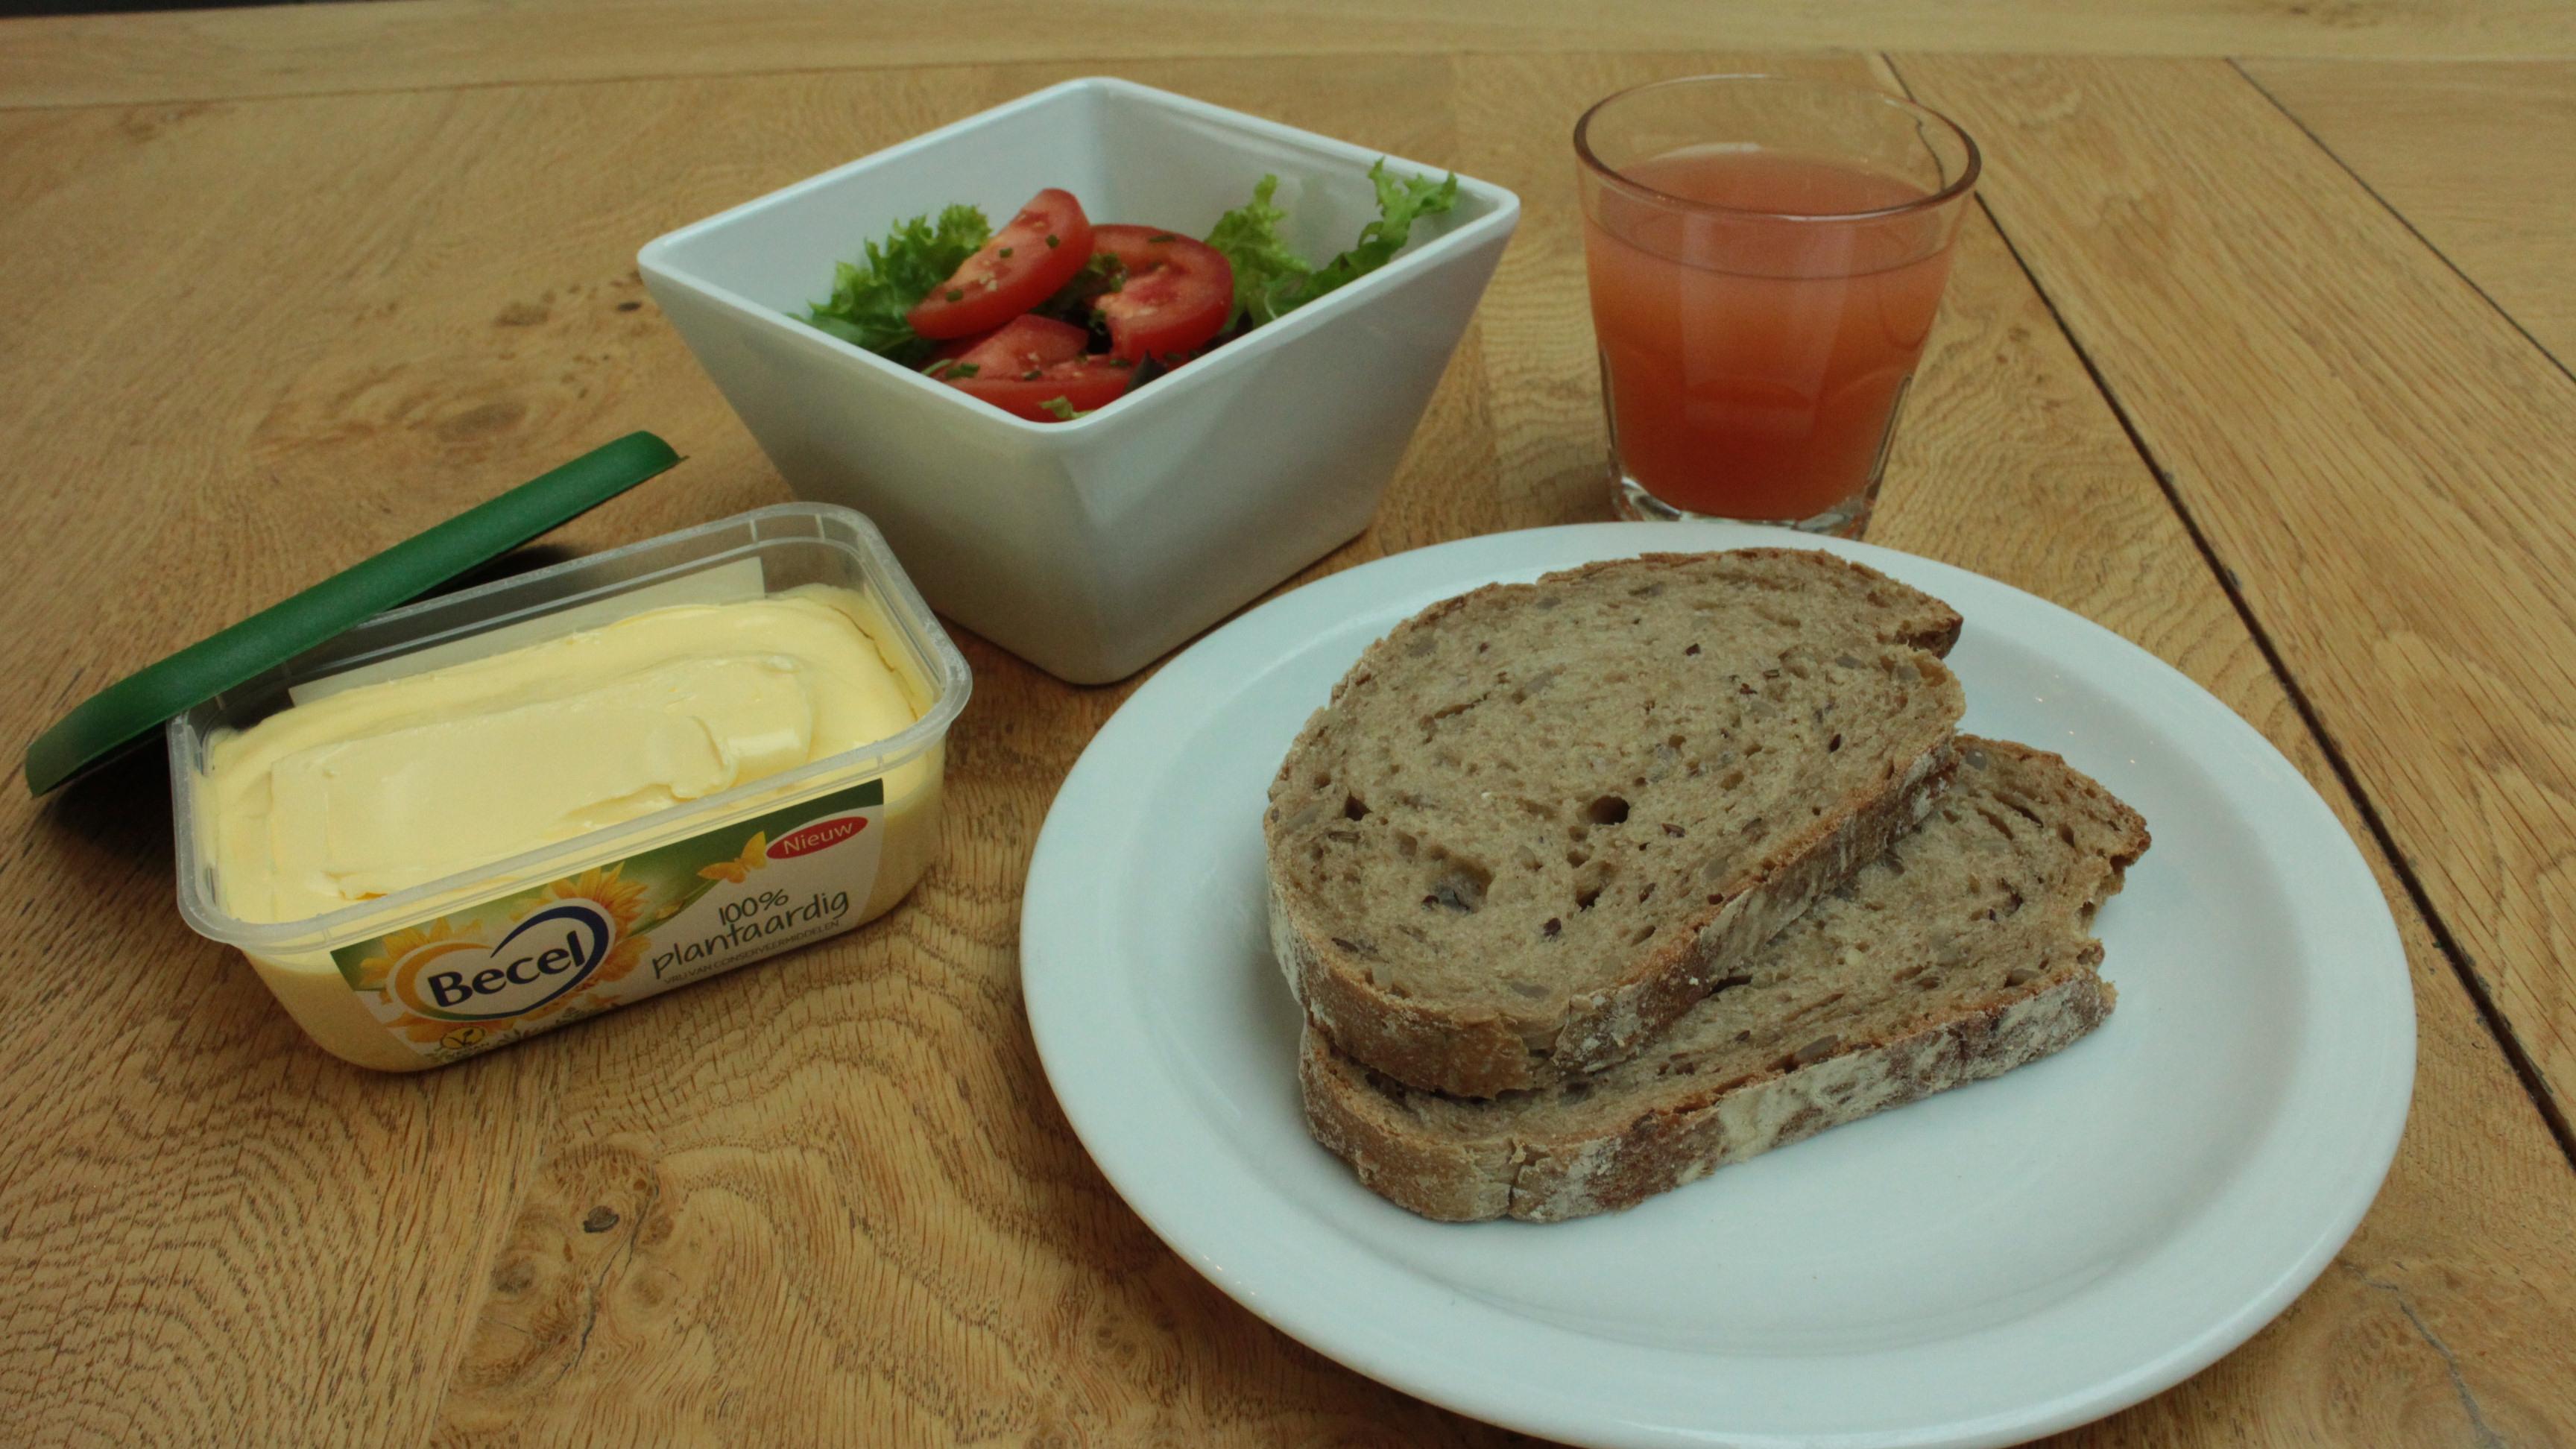 Vegan trend op je brood, met Becel 100% plantaardig